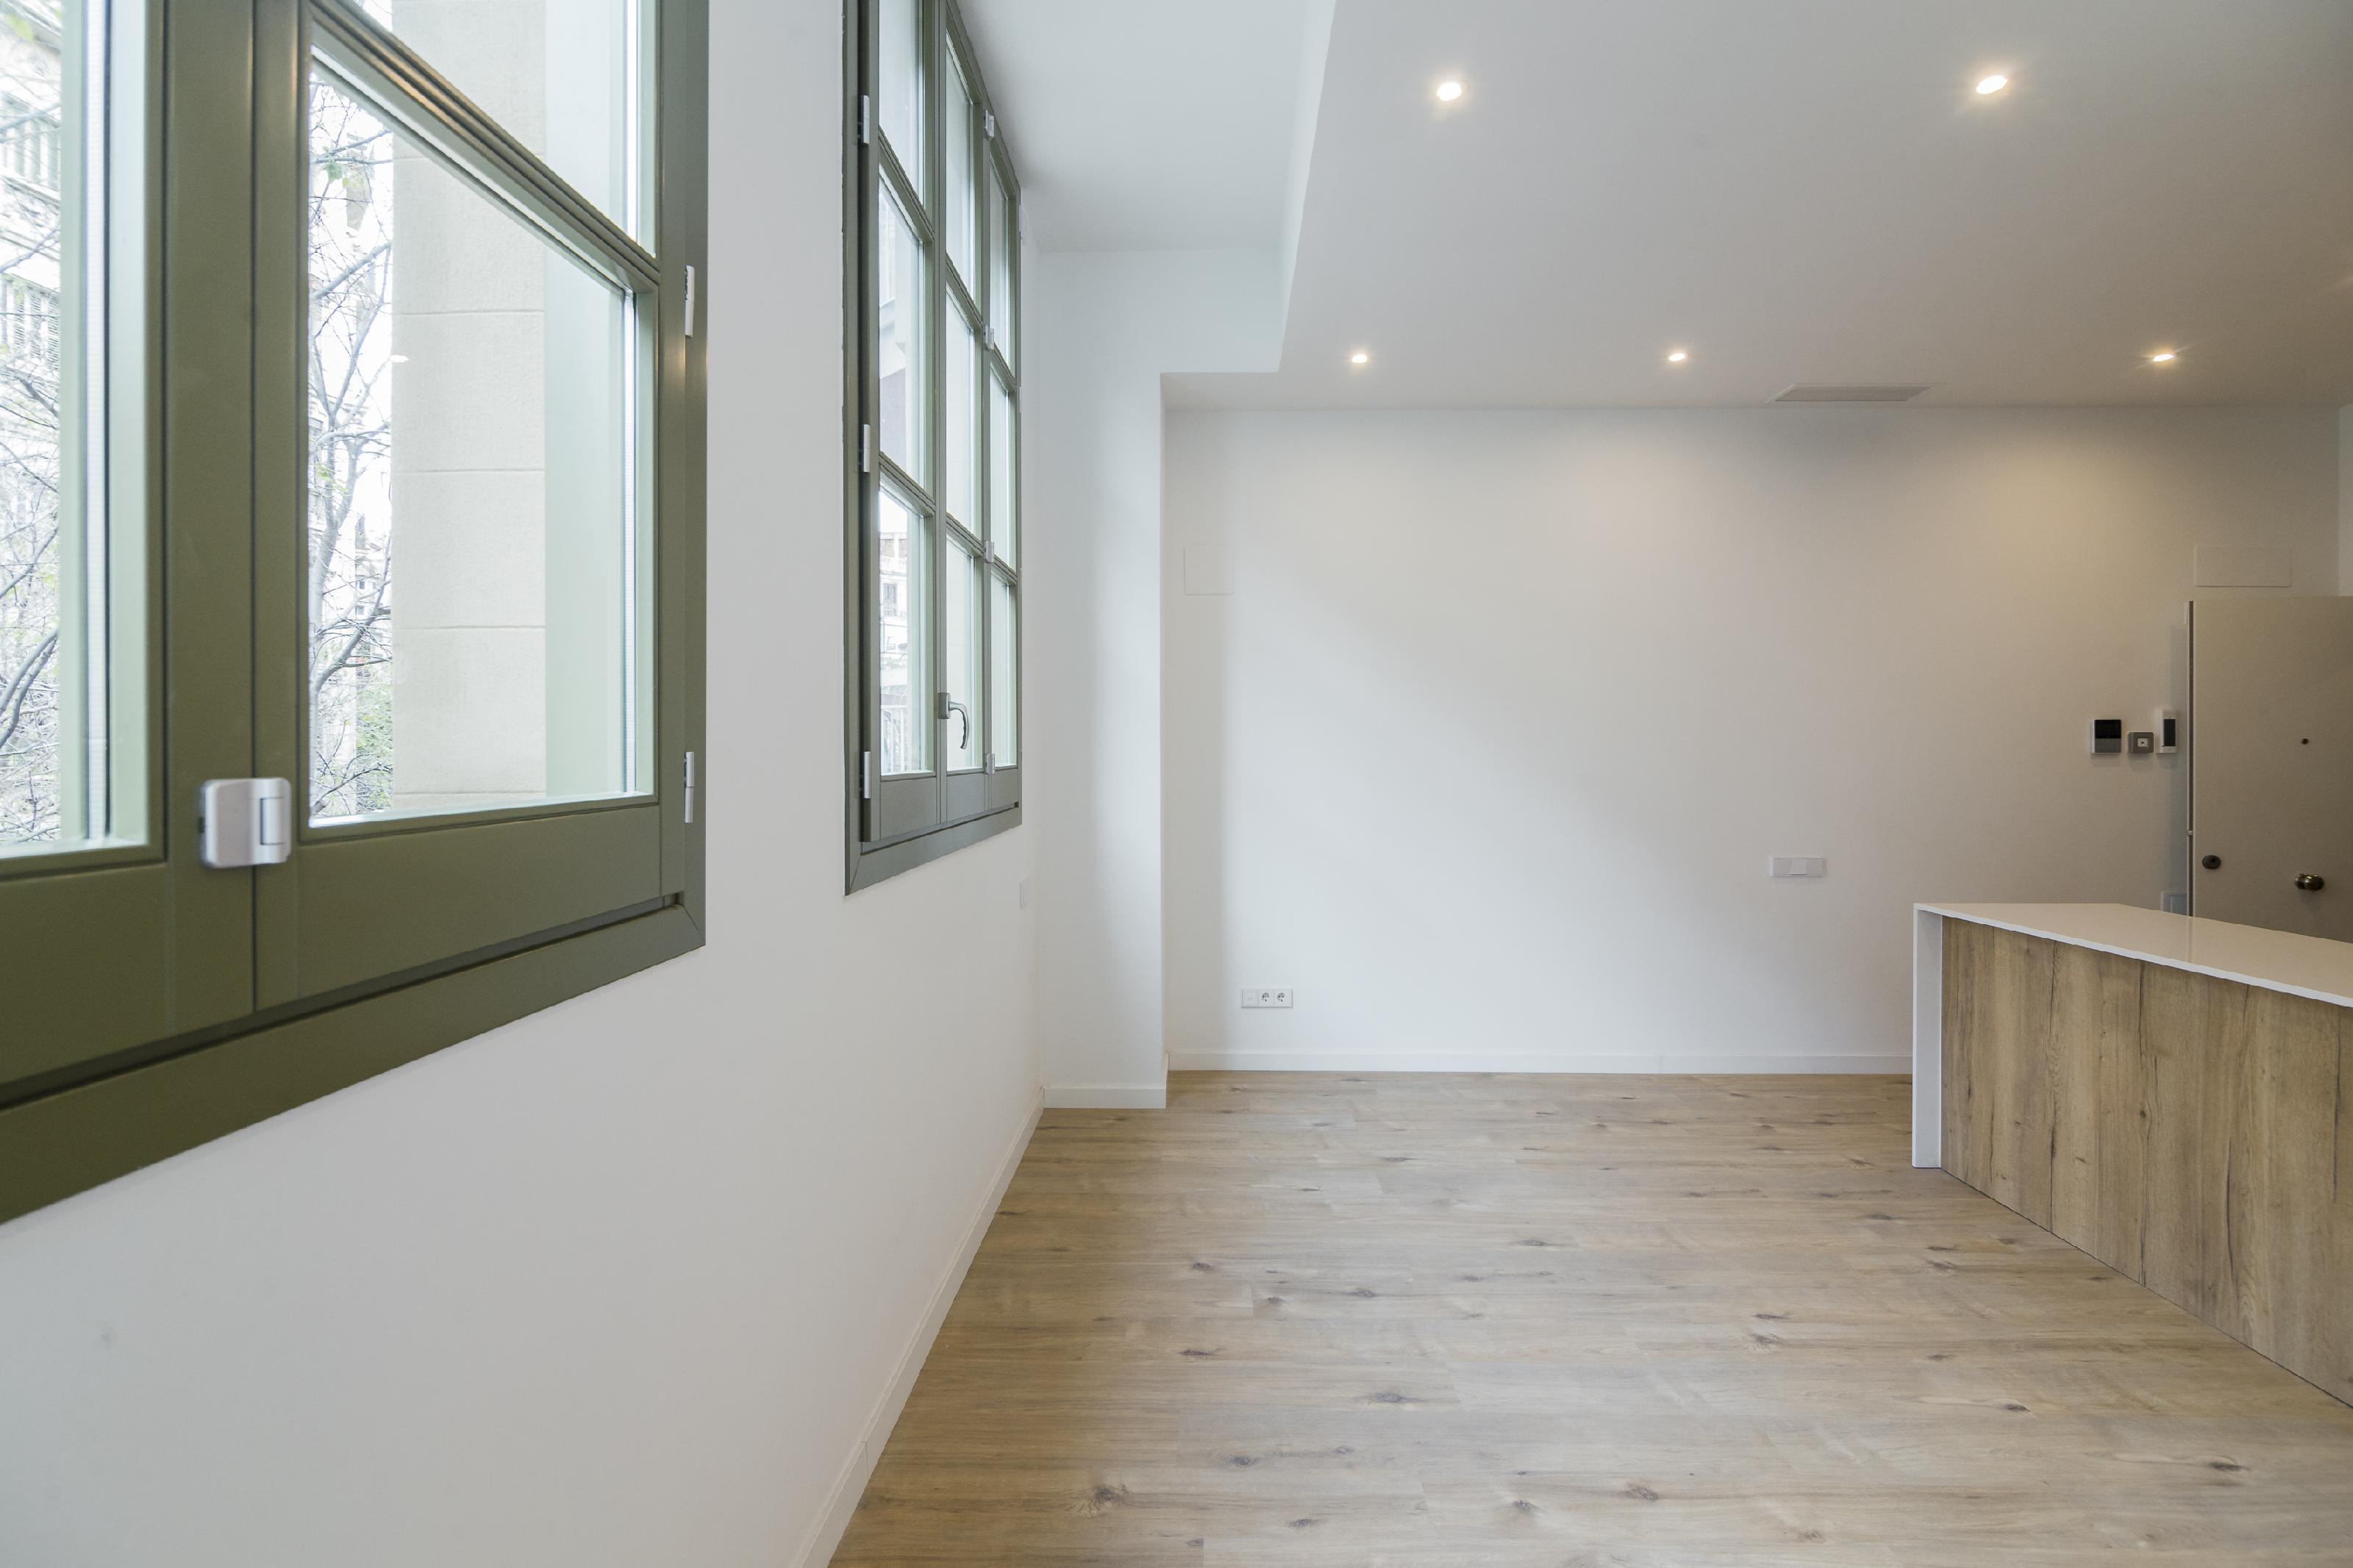 249267 Flat for sale in Eixample, Nova Esquerra Eixample 15